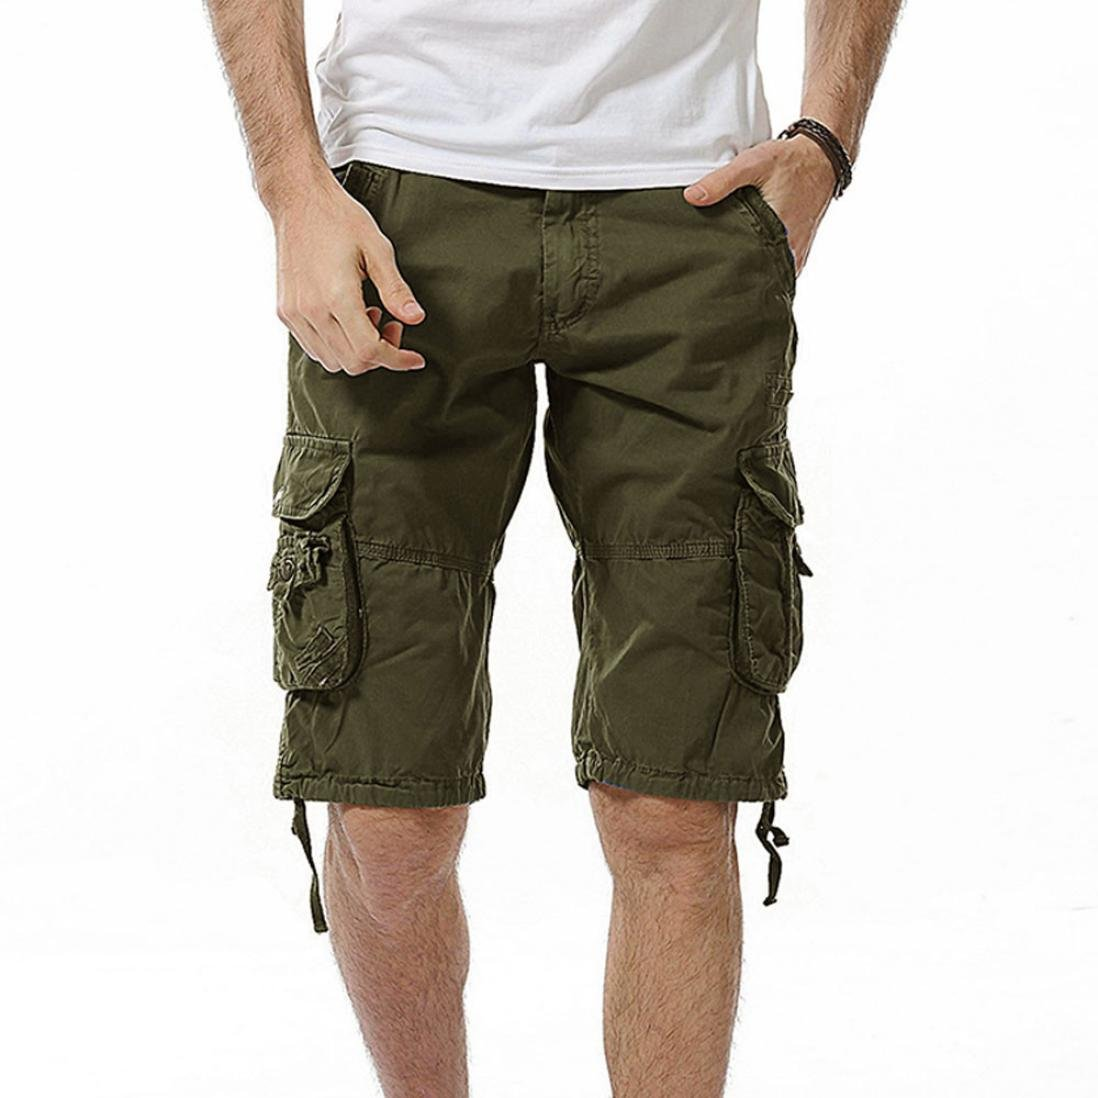 Clearance! PASATO Classic Mens Casual Pocket Beach Work Casual Men Short Trouser Shorts Pants(Green, 38)